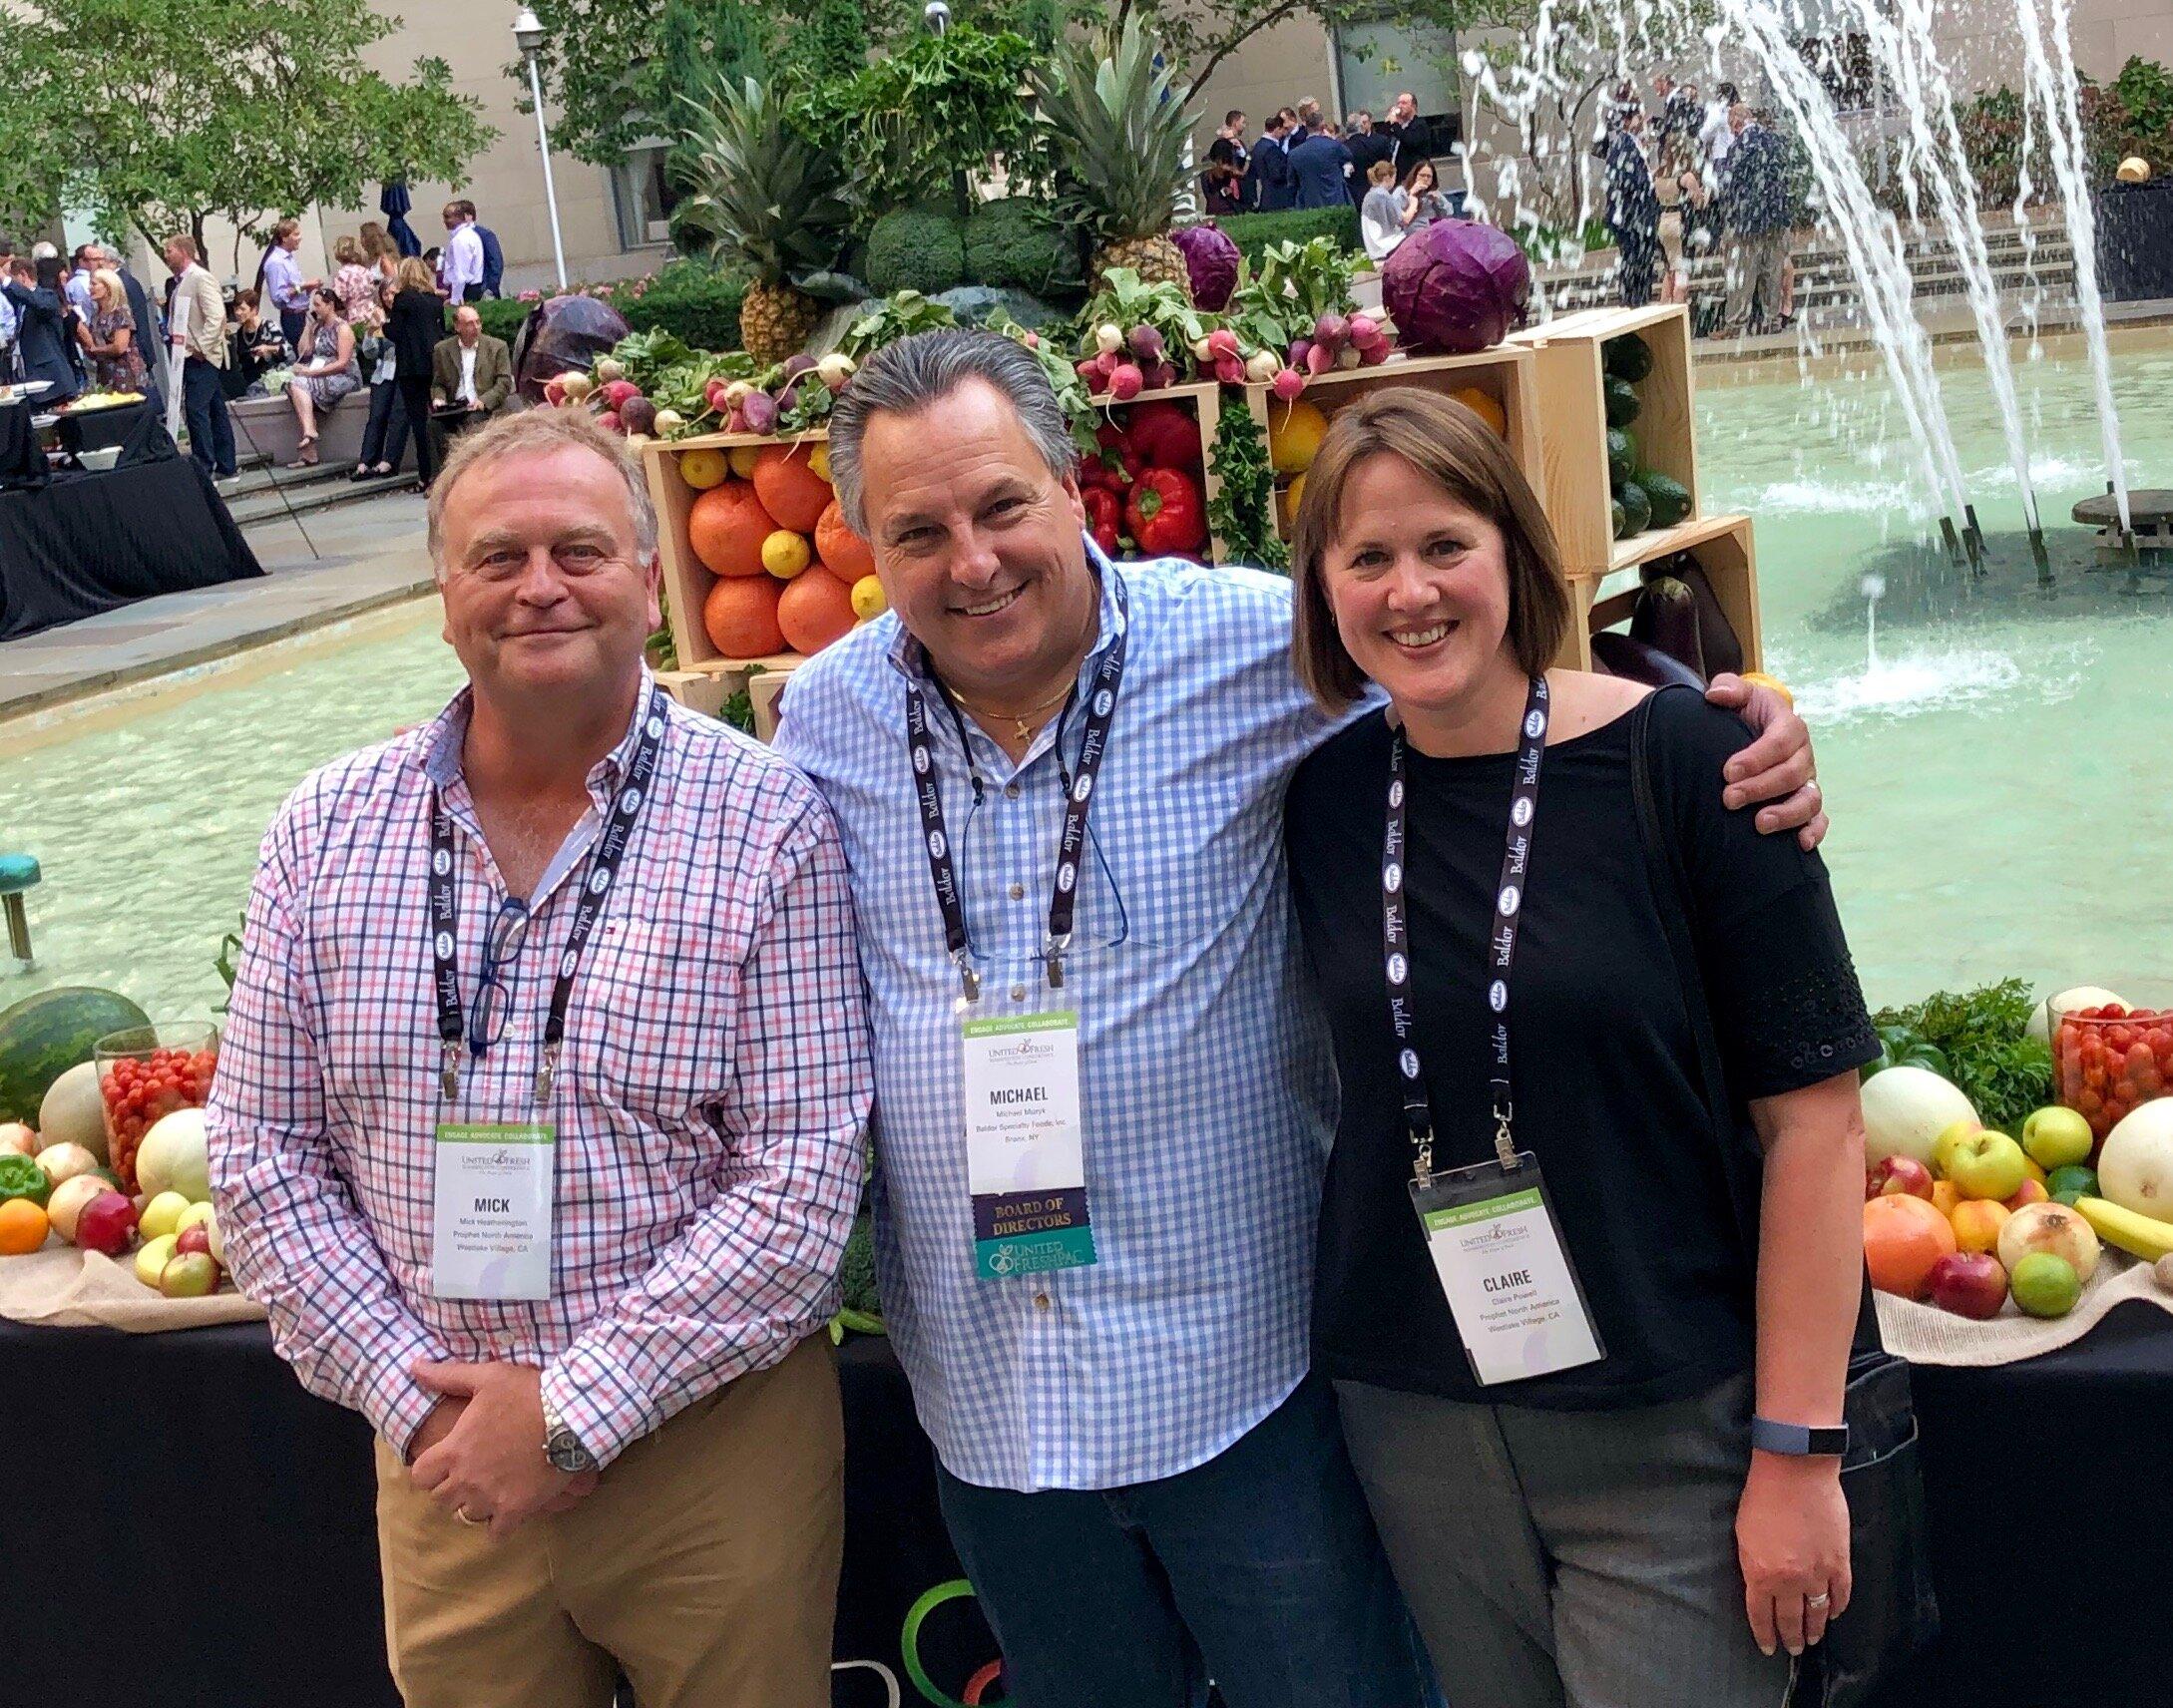 Mick Heatherington, Michael Muzyk – President - Baldor Specialty Foods, Inc. & Claire Powell